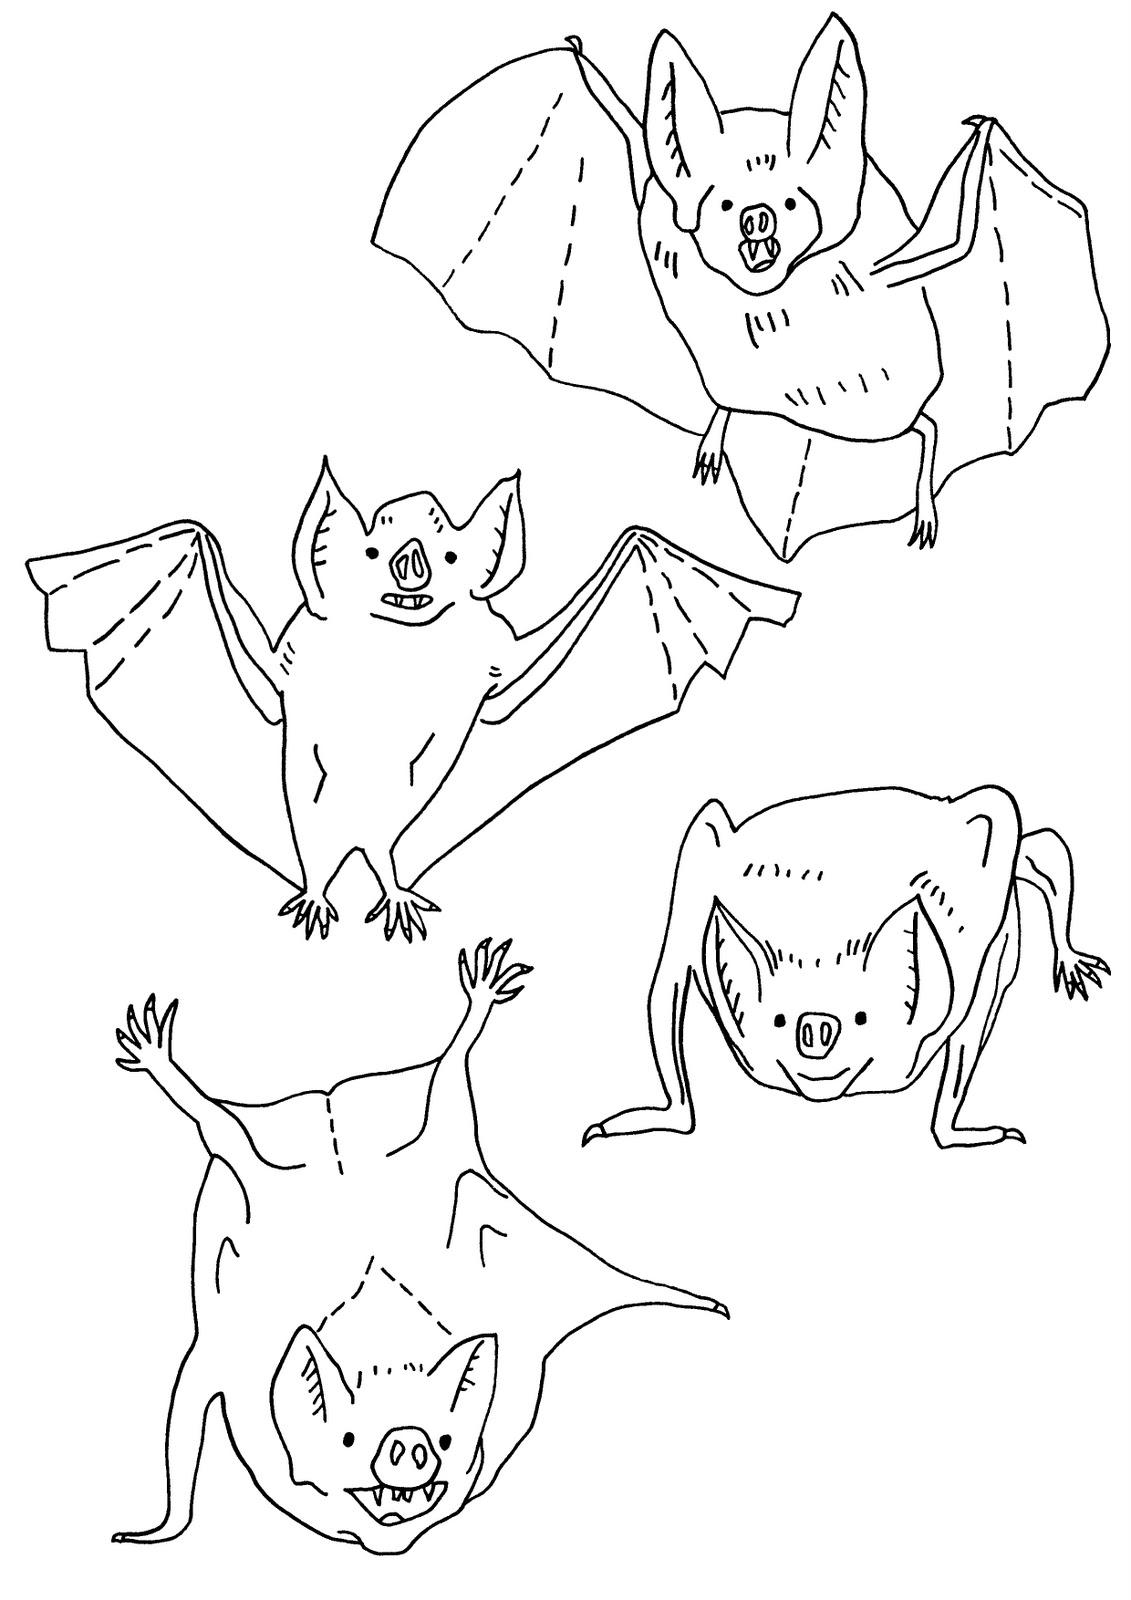 http://1.bp.blogspot.com/_HHROpjYmAwI/TRHdAkAEXDI/AAAAAAAAAYQ/o_mhBSL4QFQ/s1600/bats+by+helen.JPG